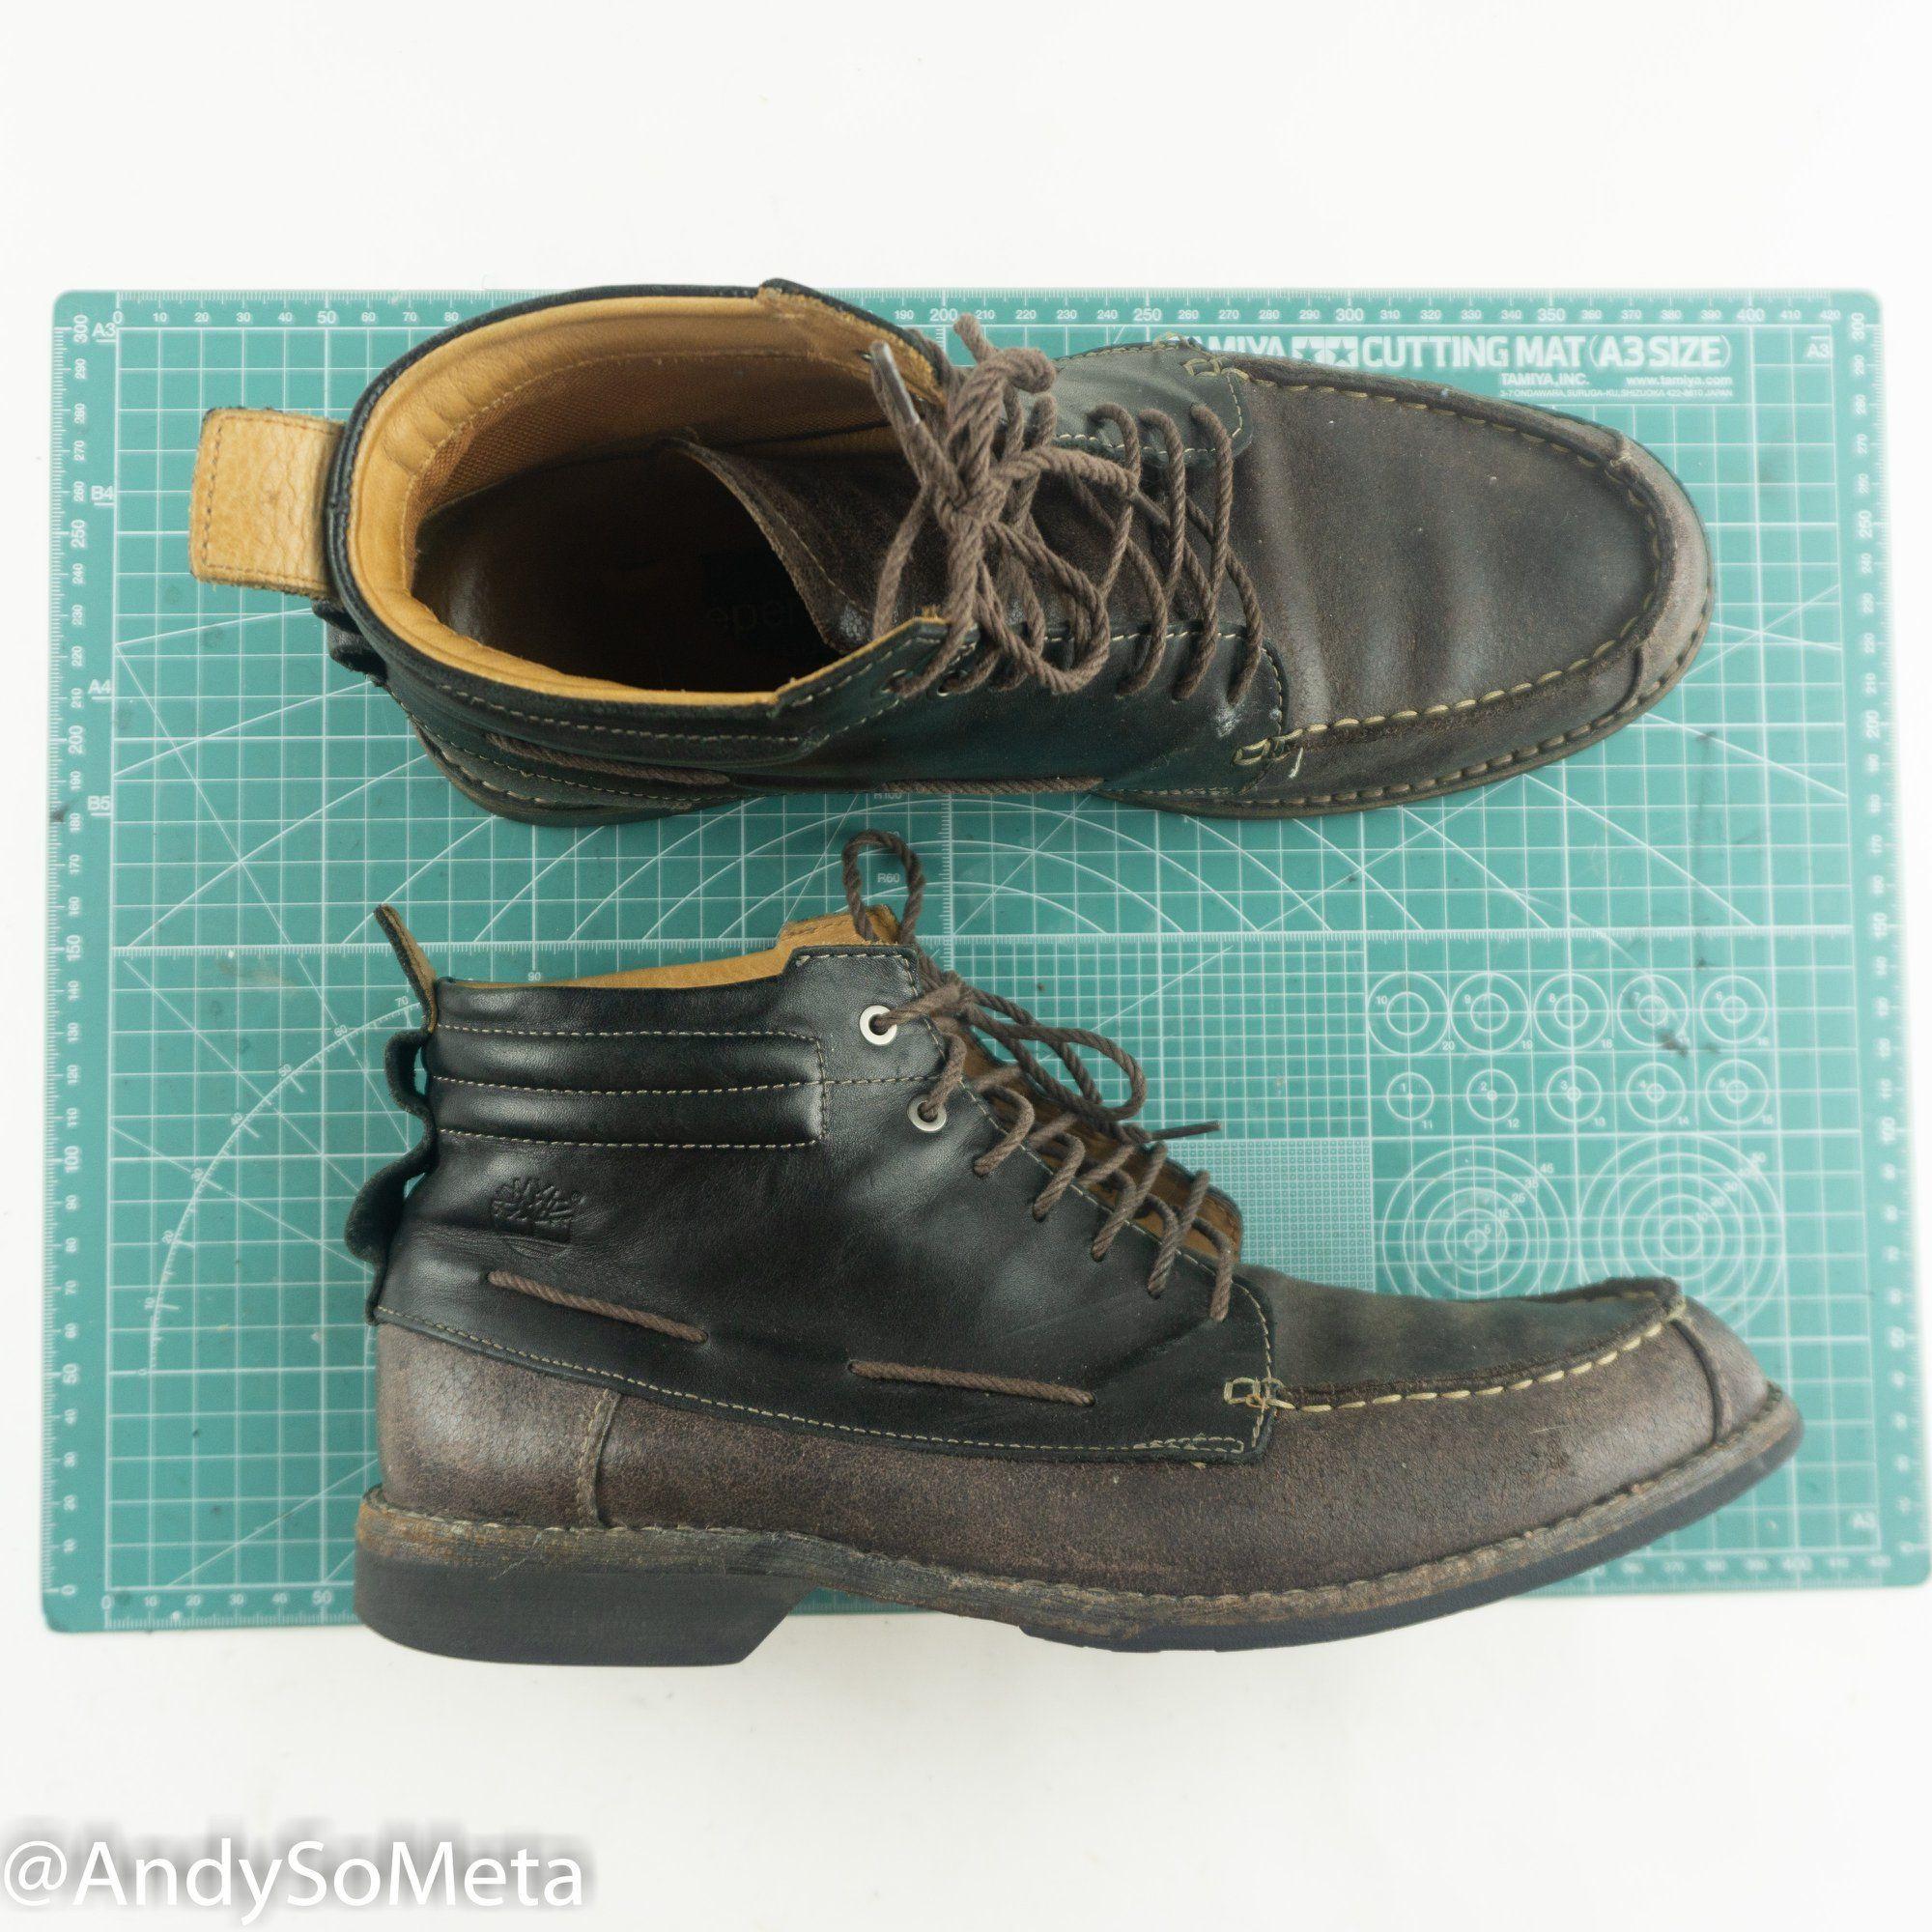 Timberland Men's 9M Earthkeepers City Moc Toe Chukka Boots